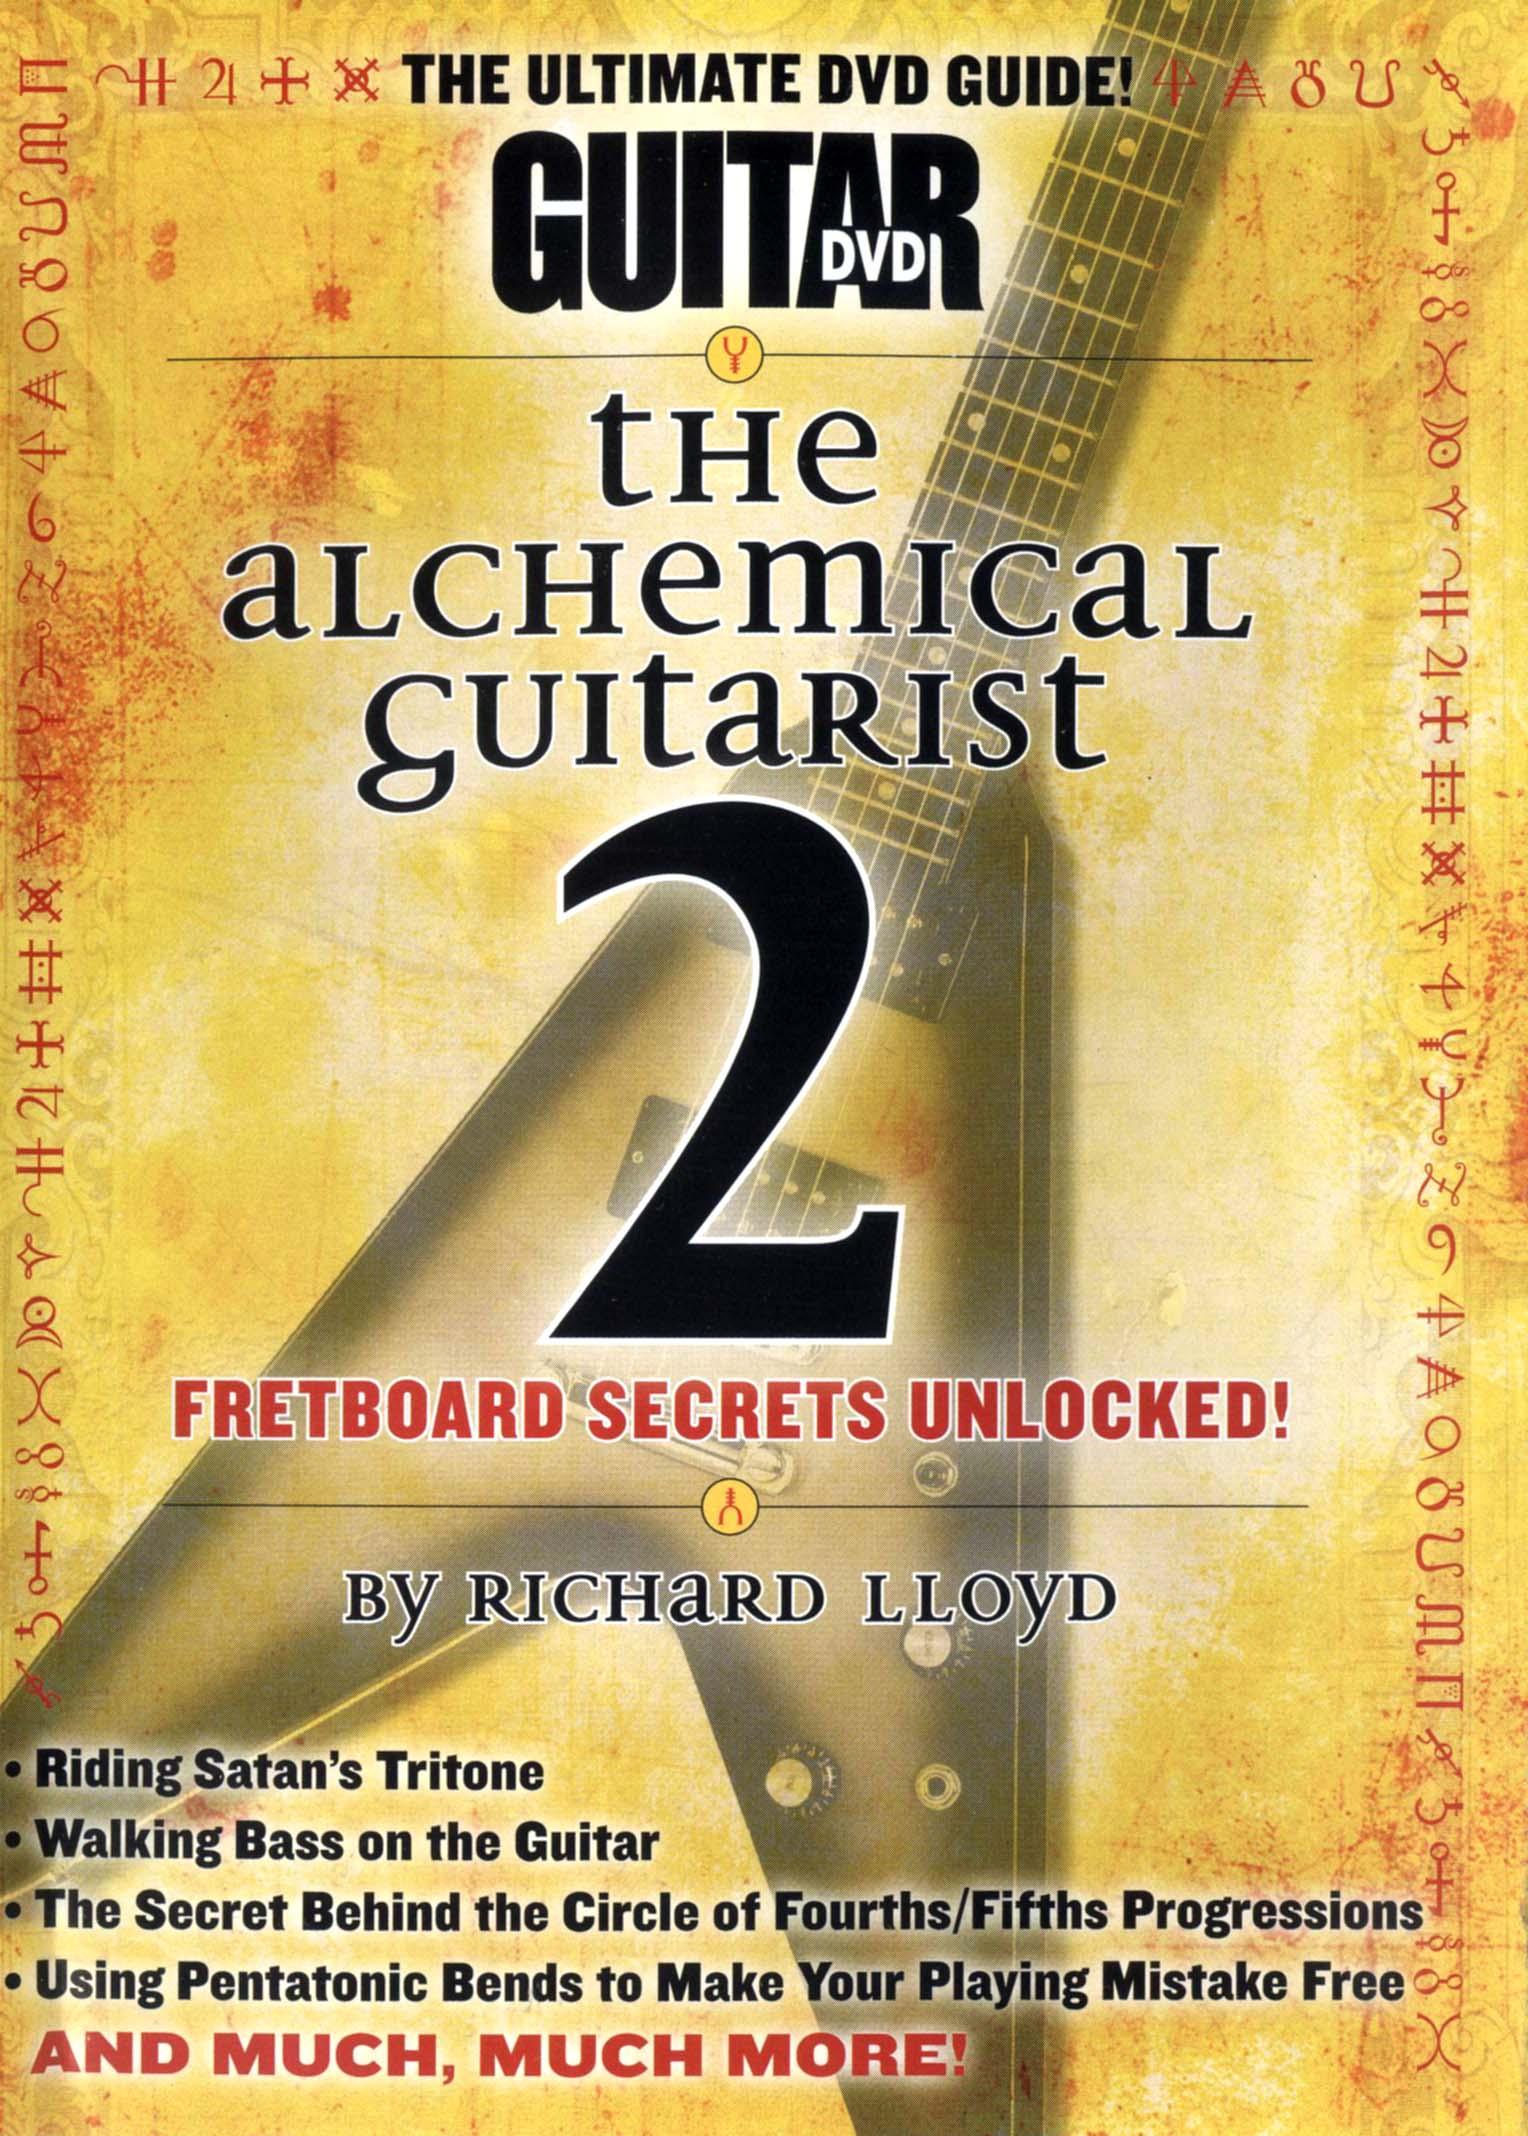 Guitar World: The Alchemical Guitarist, Vol. 2